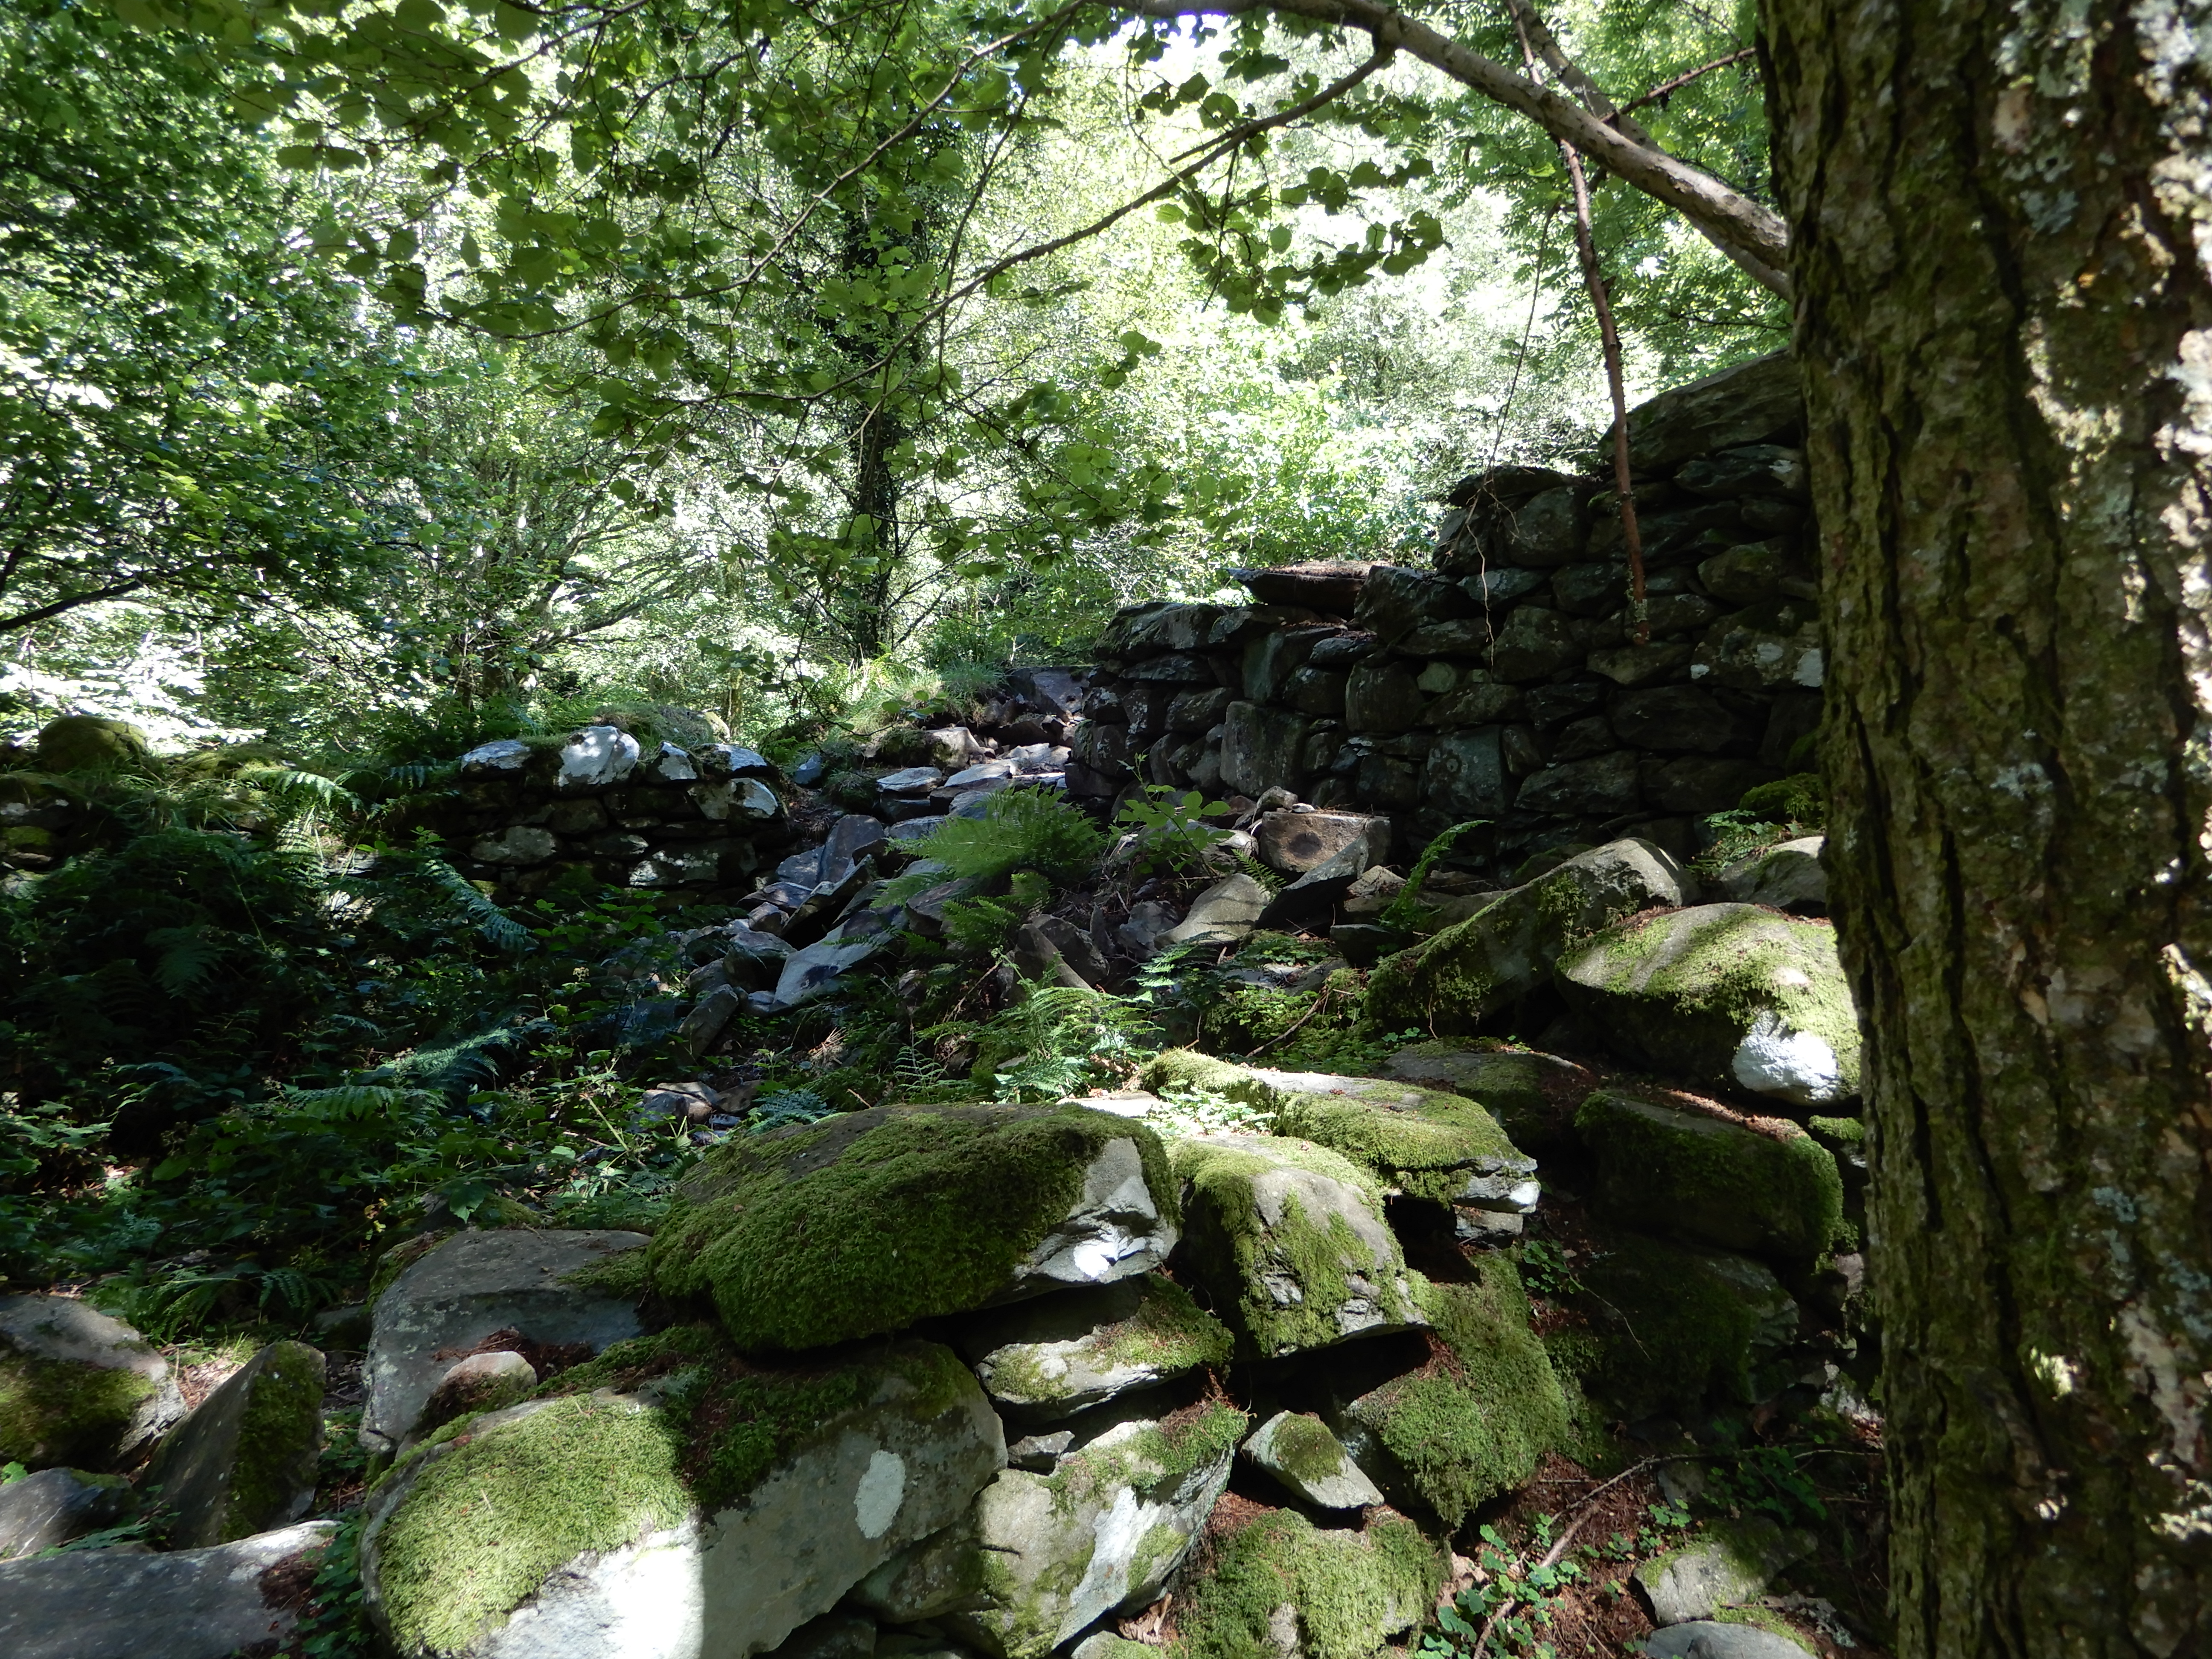 Photo of derelict stone cottage walls